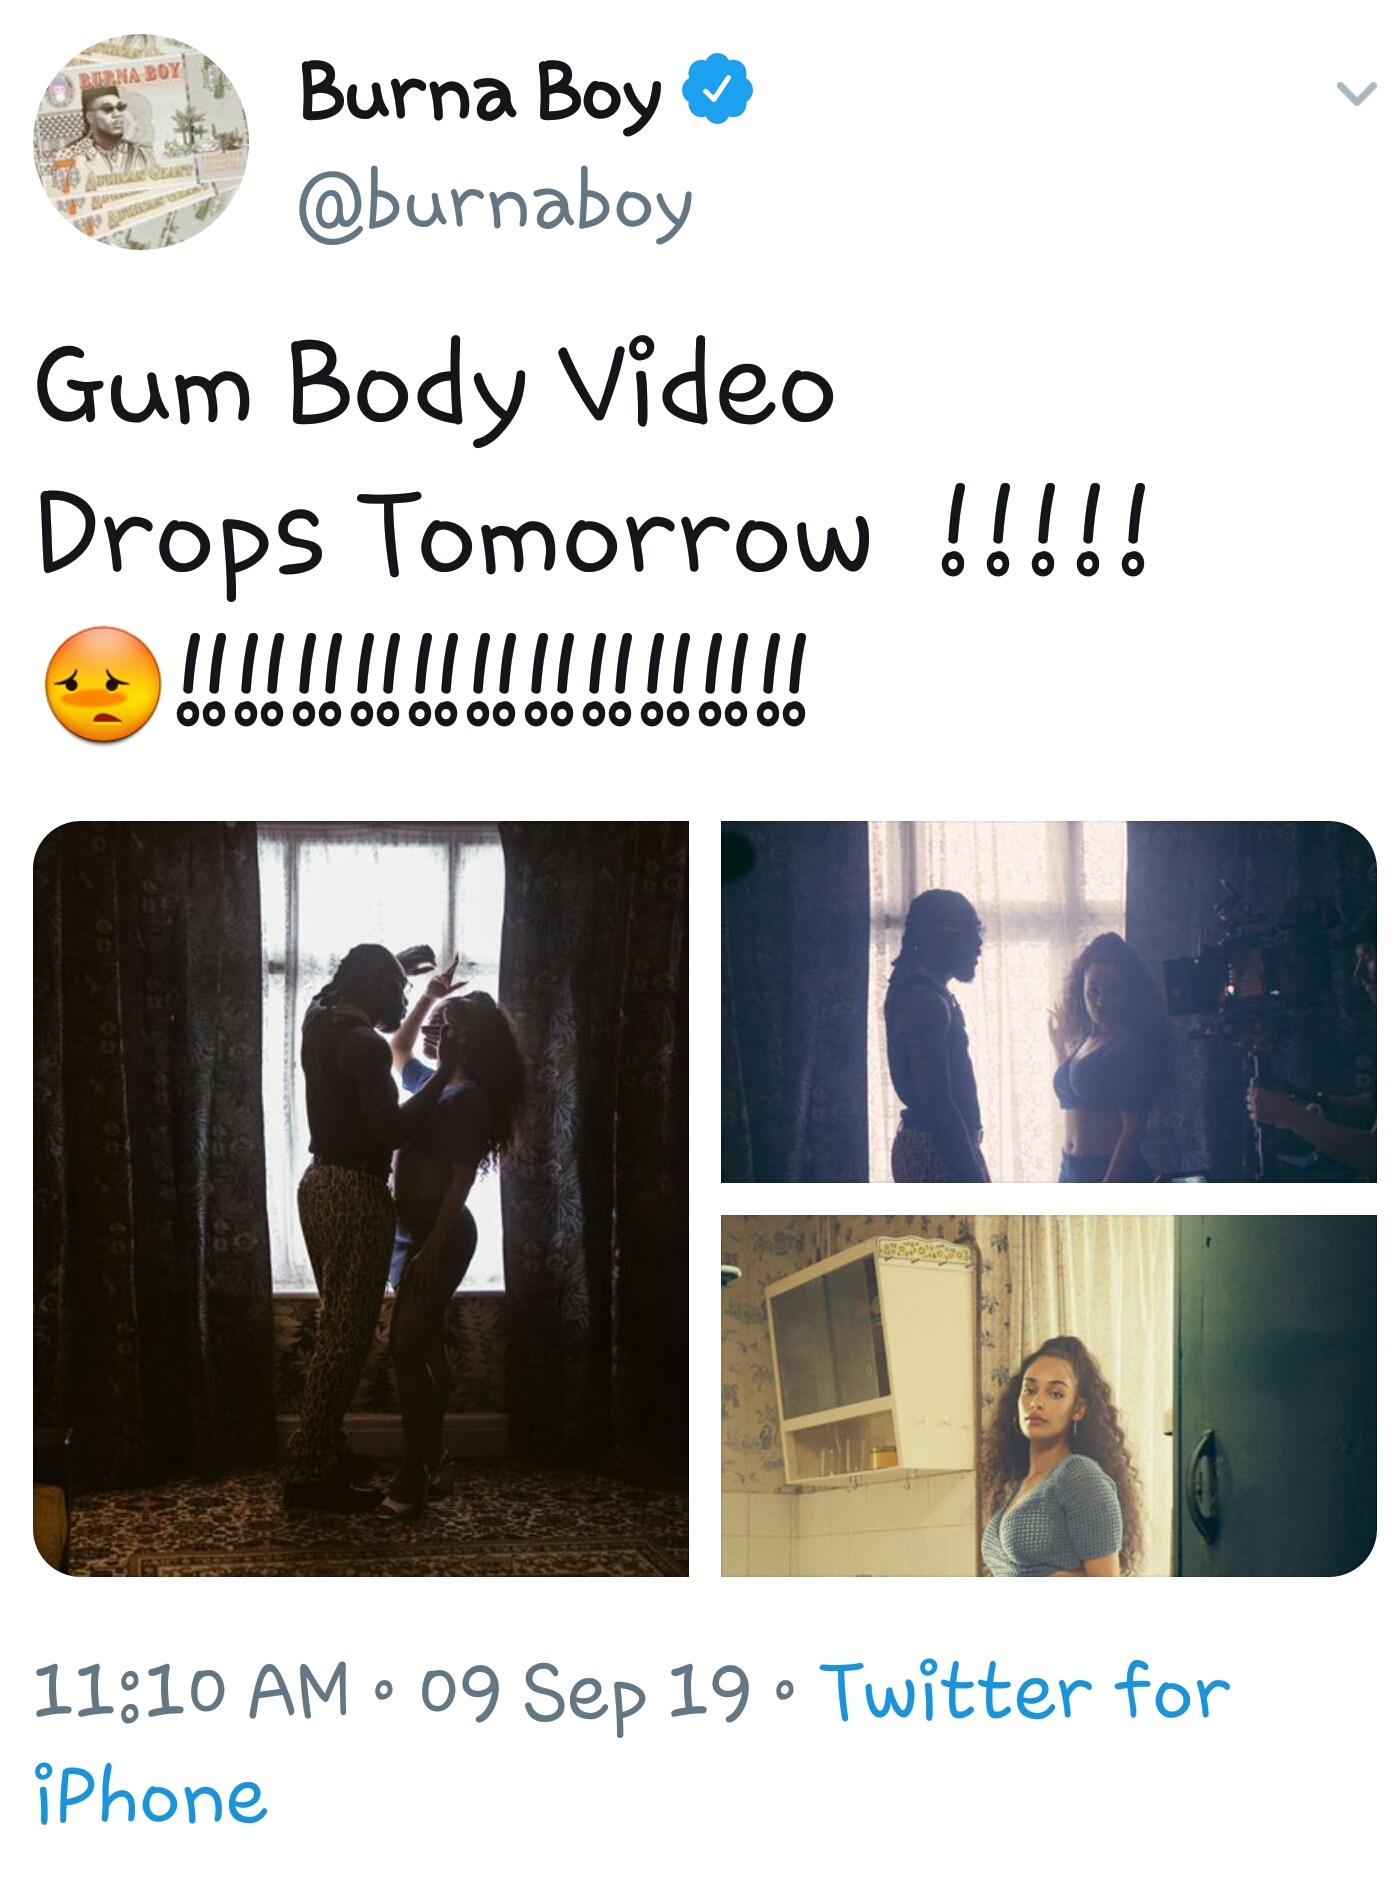 Burna Boy set to drop Gum Body video tomorrow